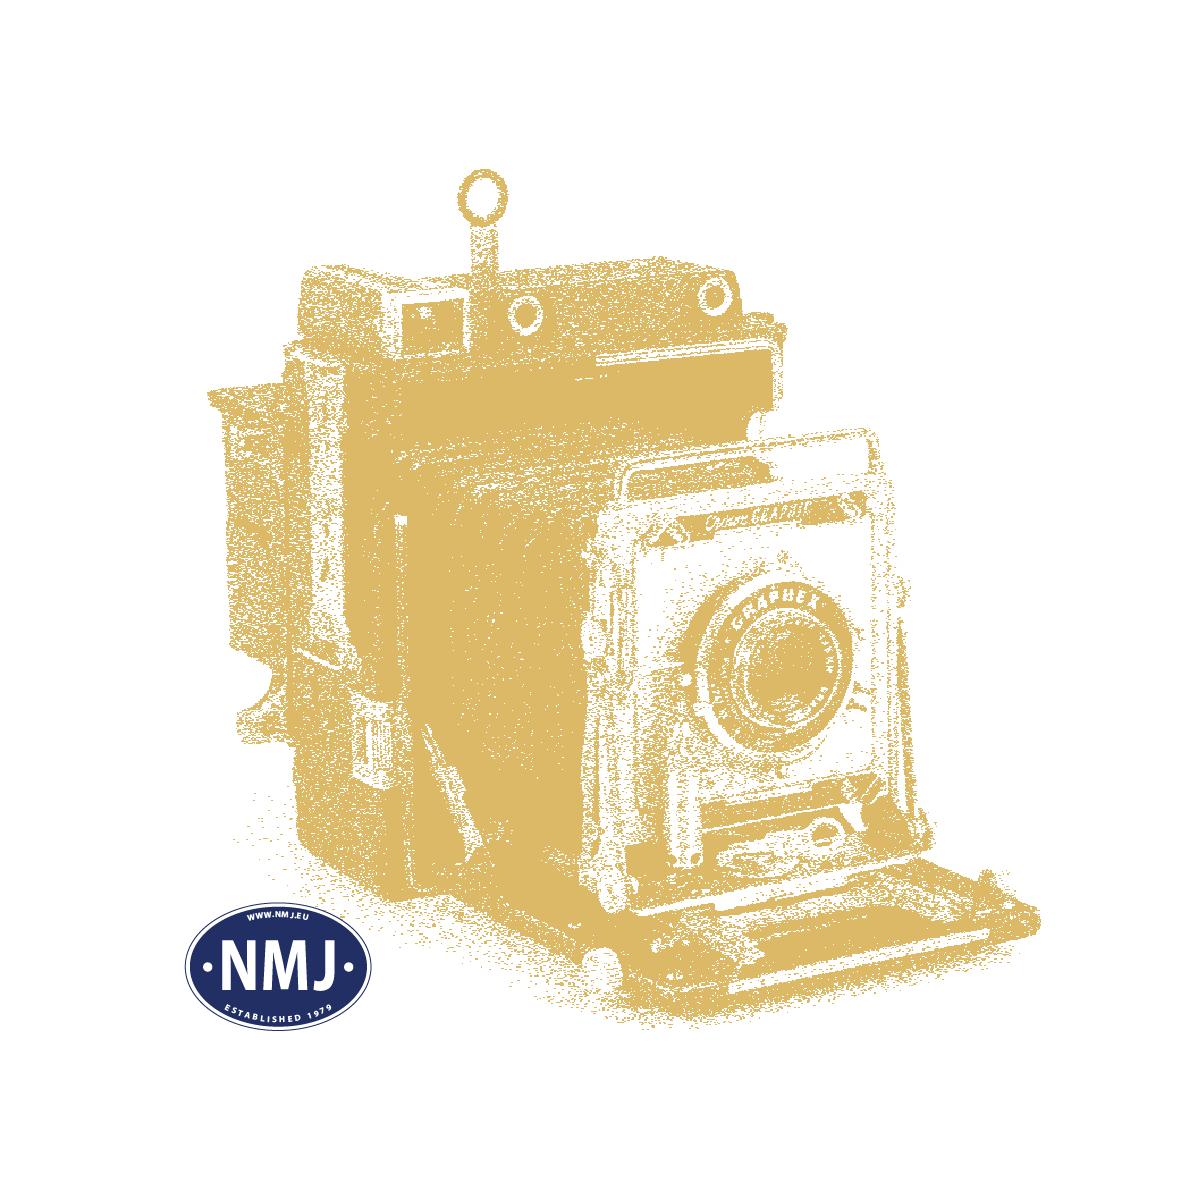 MWB-P203 - Gresstuster, Sen Sommer, 2 mm, 21 x 15 Cm